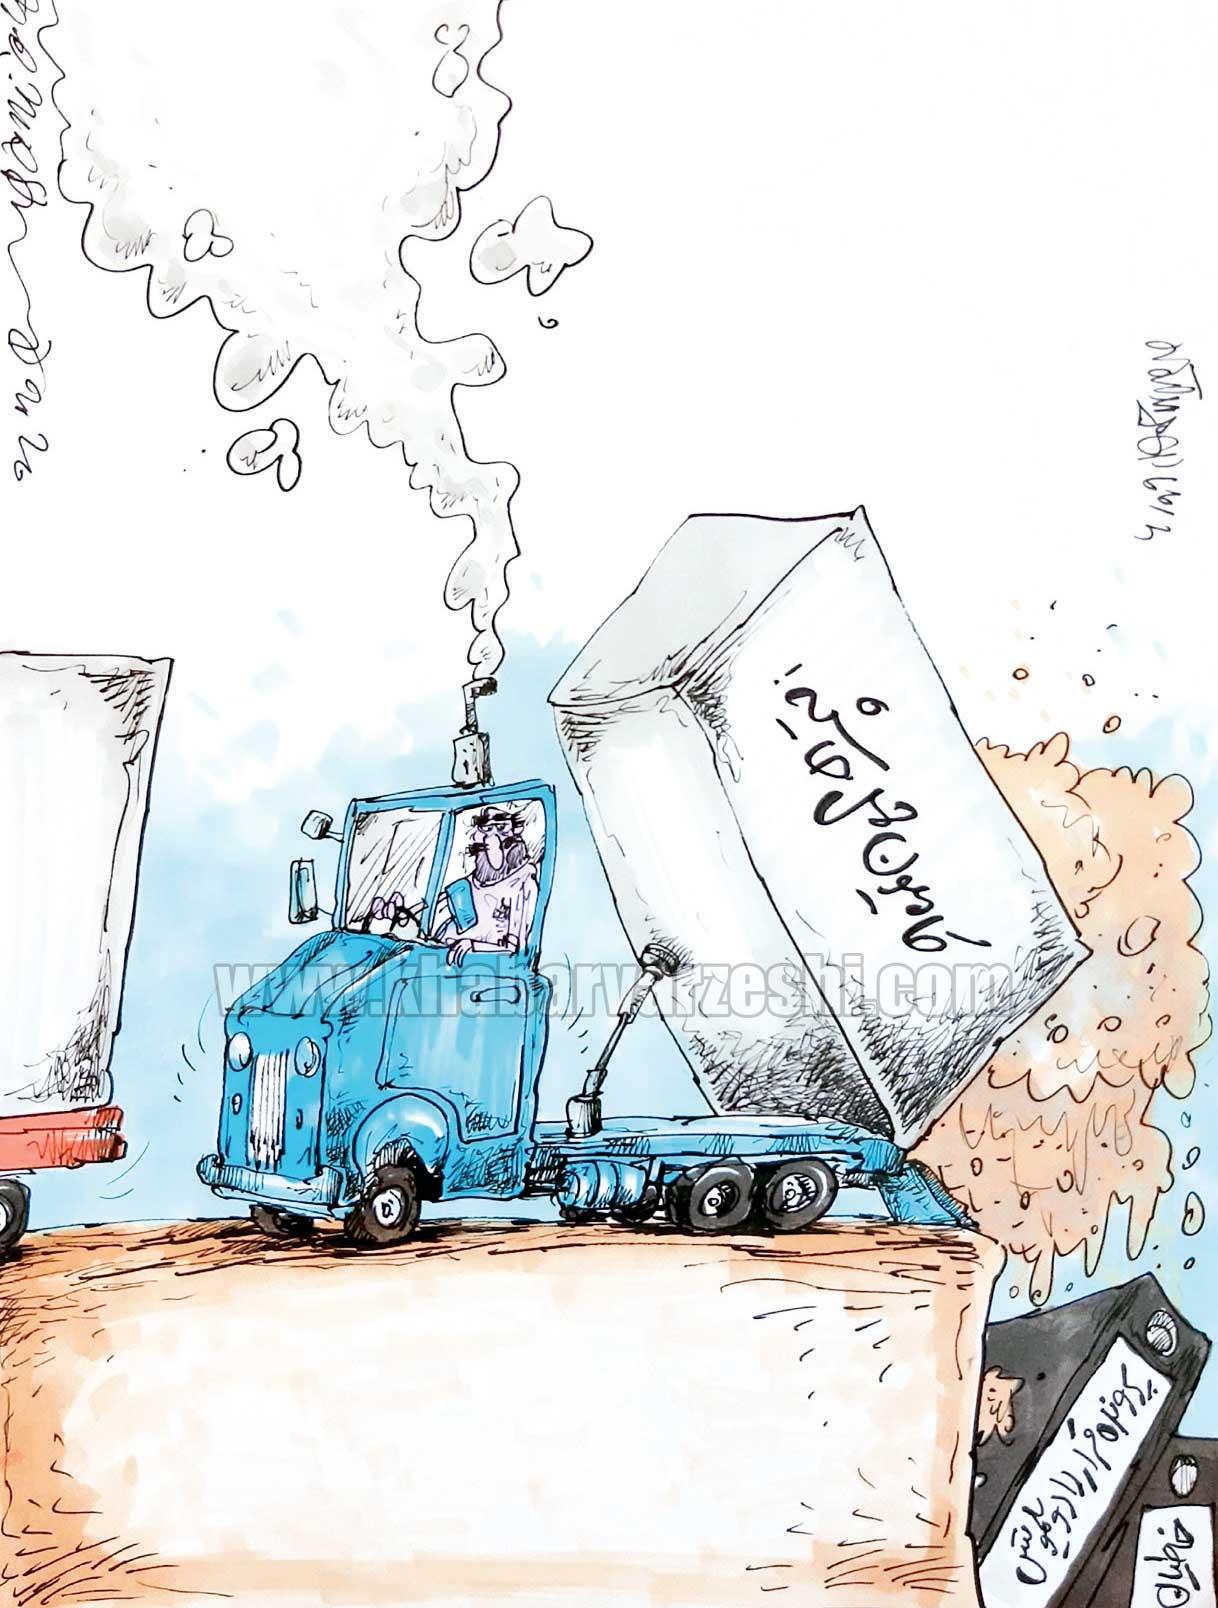 کارتون محمدرضا میرشاهولد درباره خاطیان پرونده ویلموتس